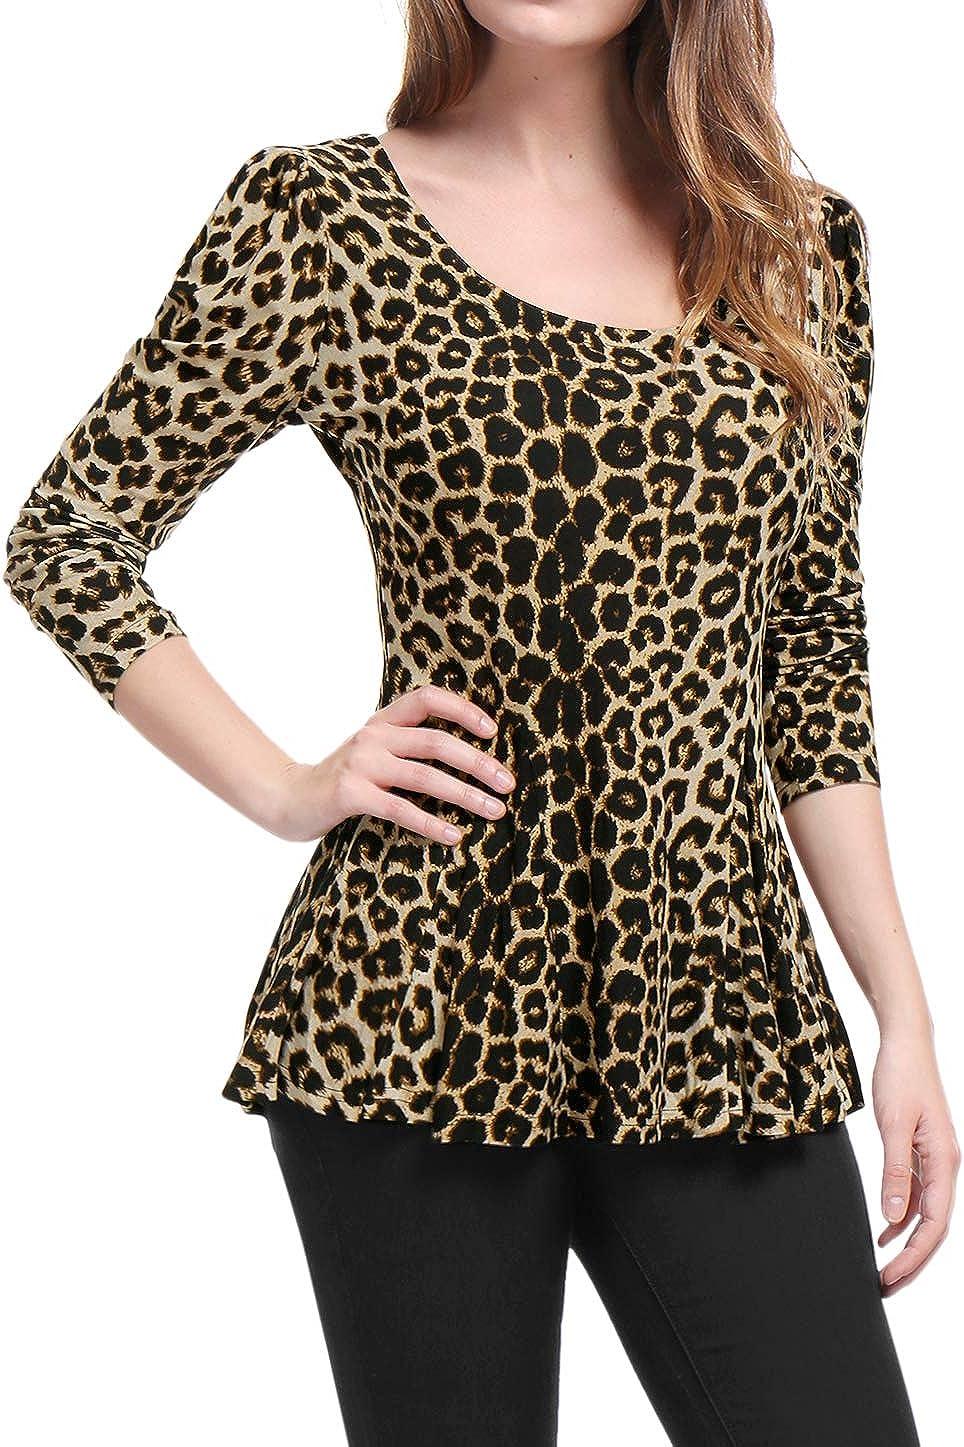 Allegra K Women's Long Sleeves Scoop Neck Peplum Shirt